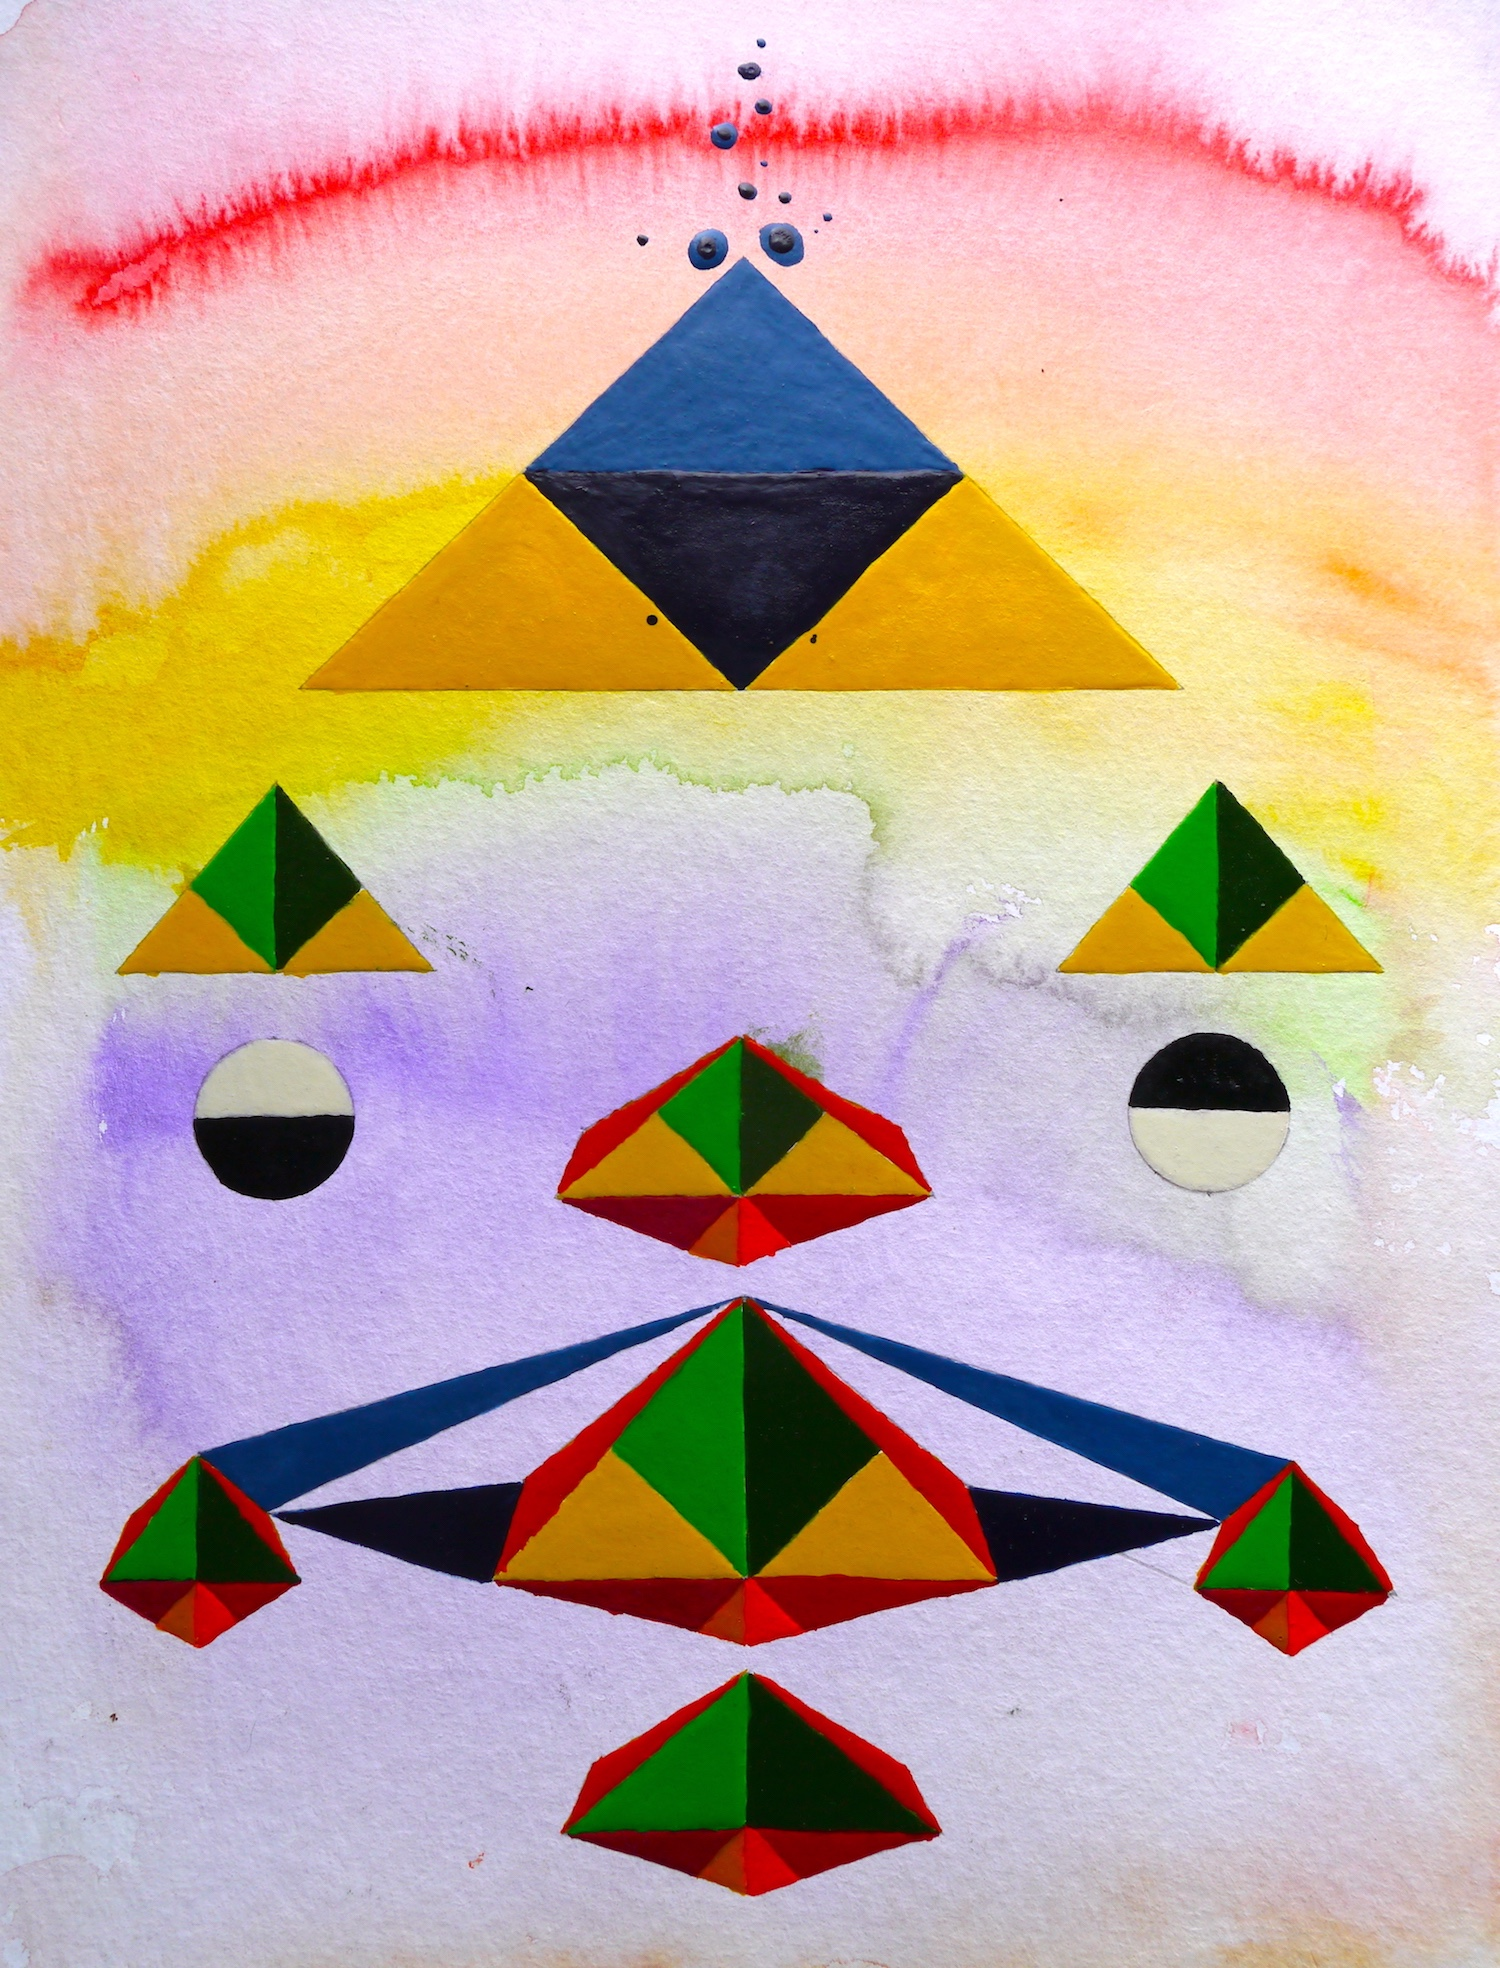 painting art space watercolor geometry geometrie aquarell cosmos cosmic malerei universe universum formen colorful silence aesthetic  kunst